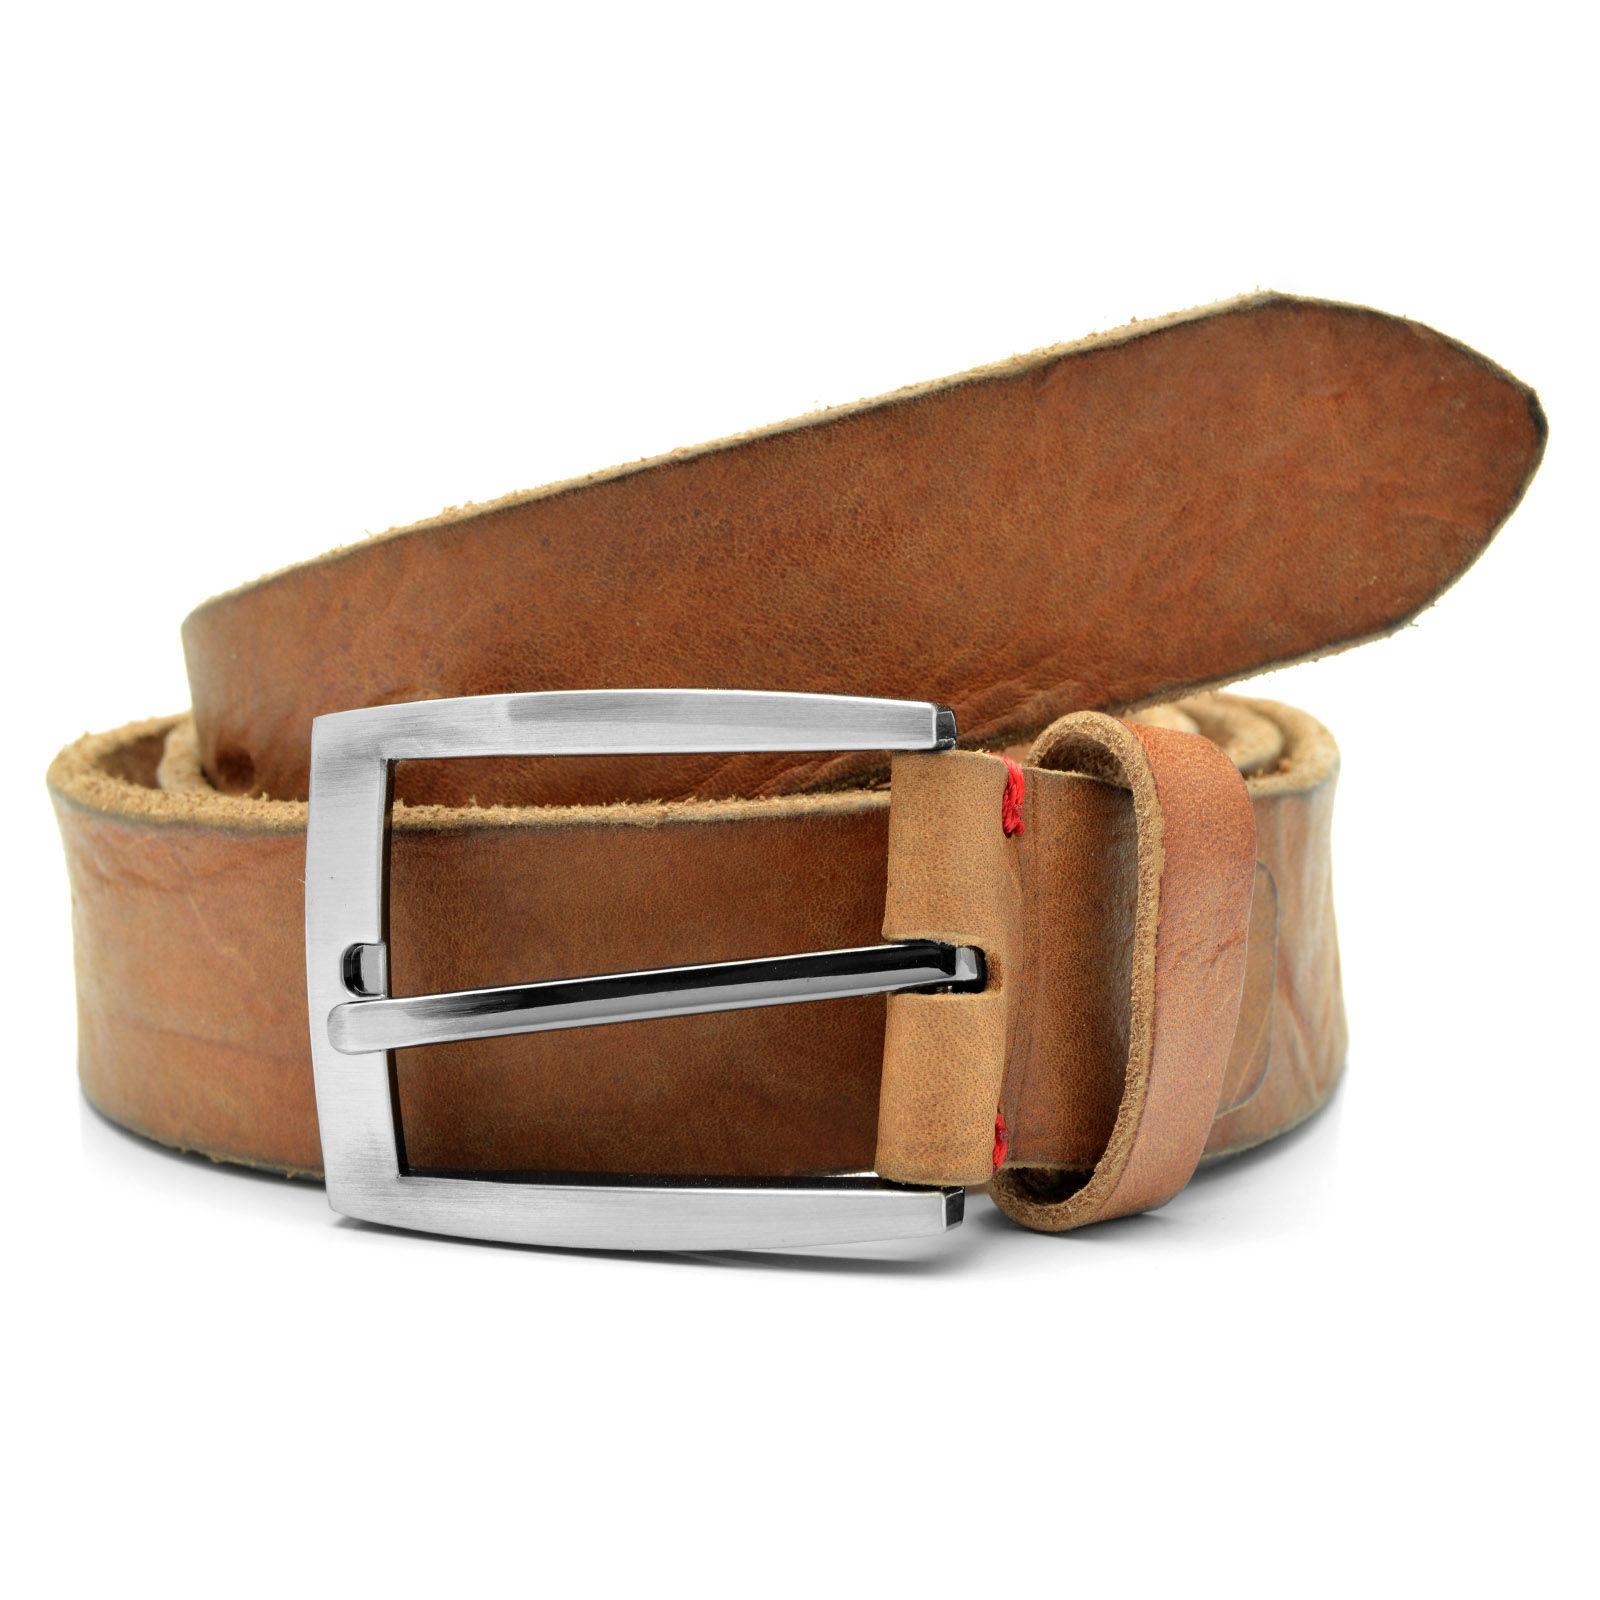 Teachers Brown Leather Belt Trendhim xJERs7DMg7